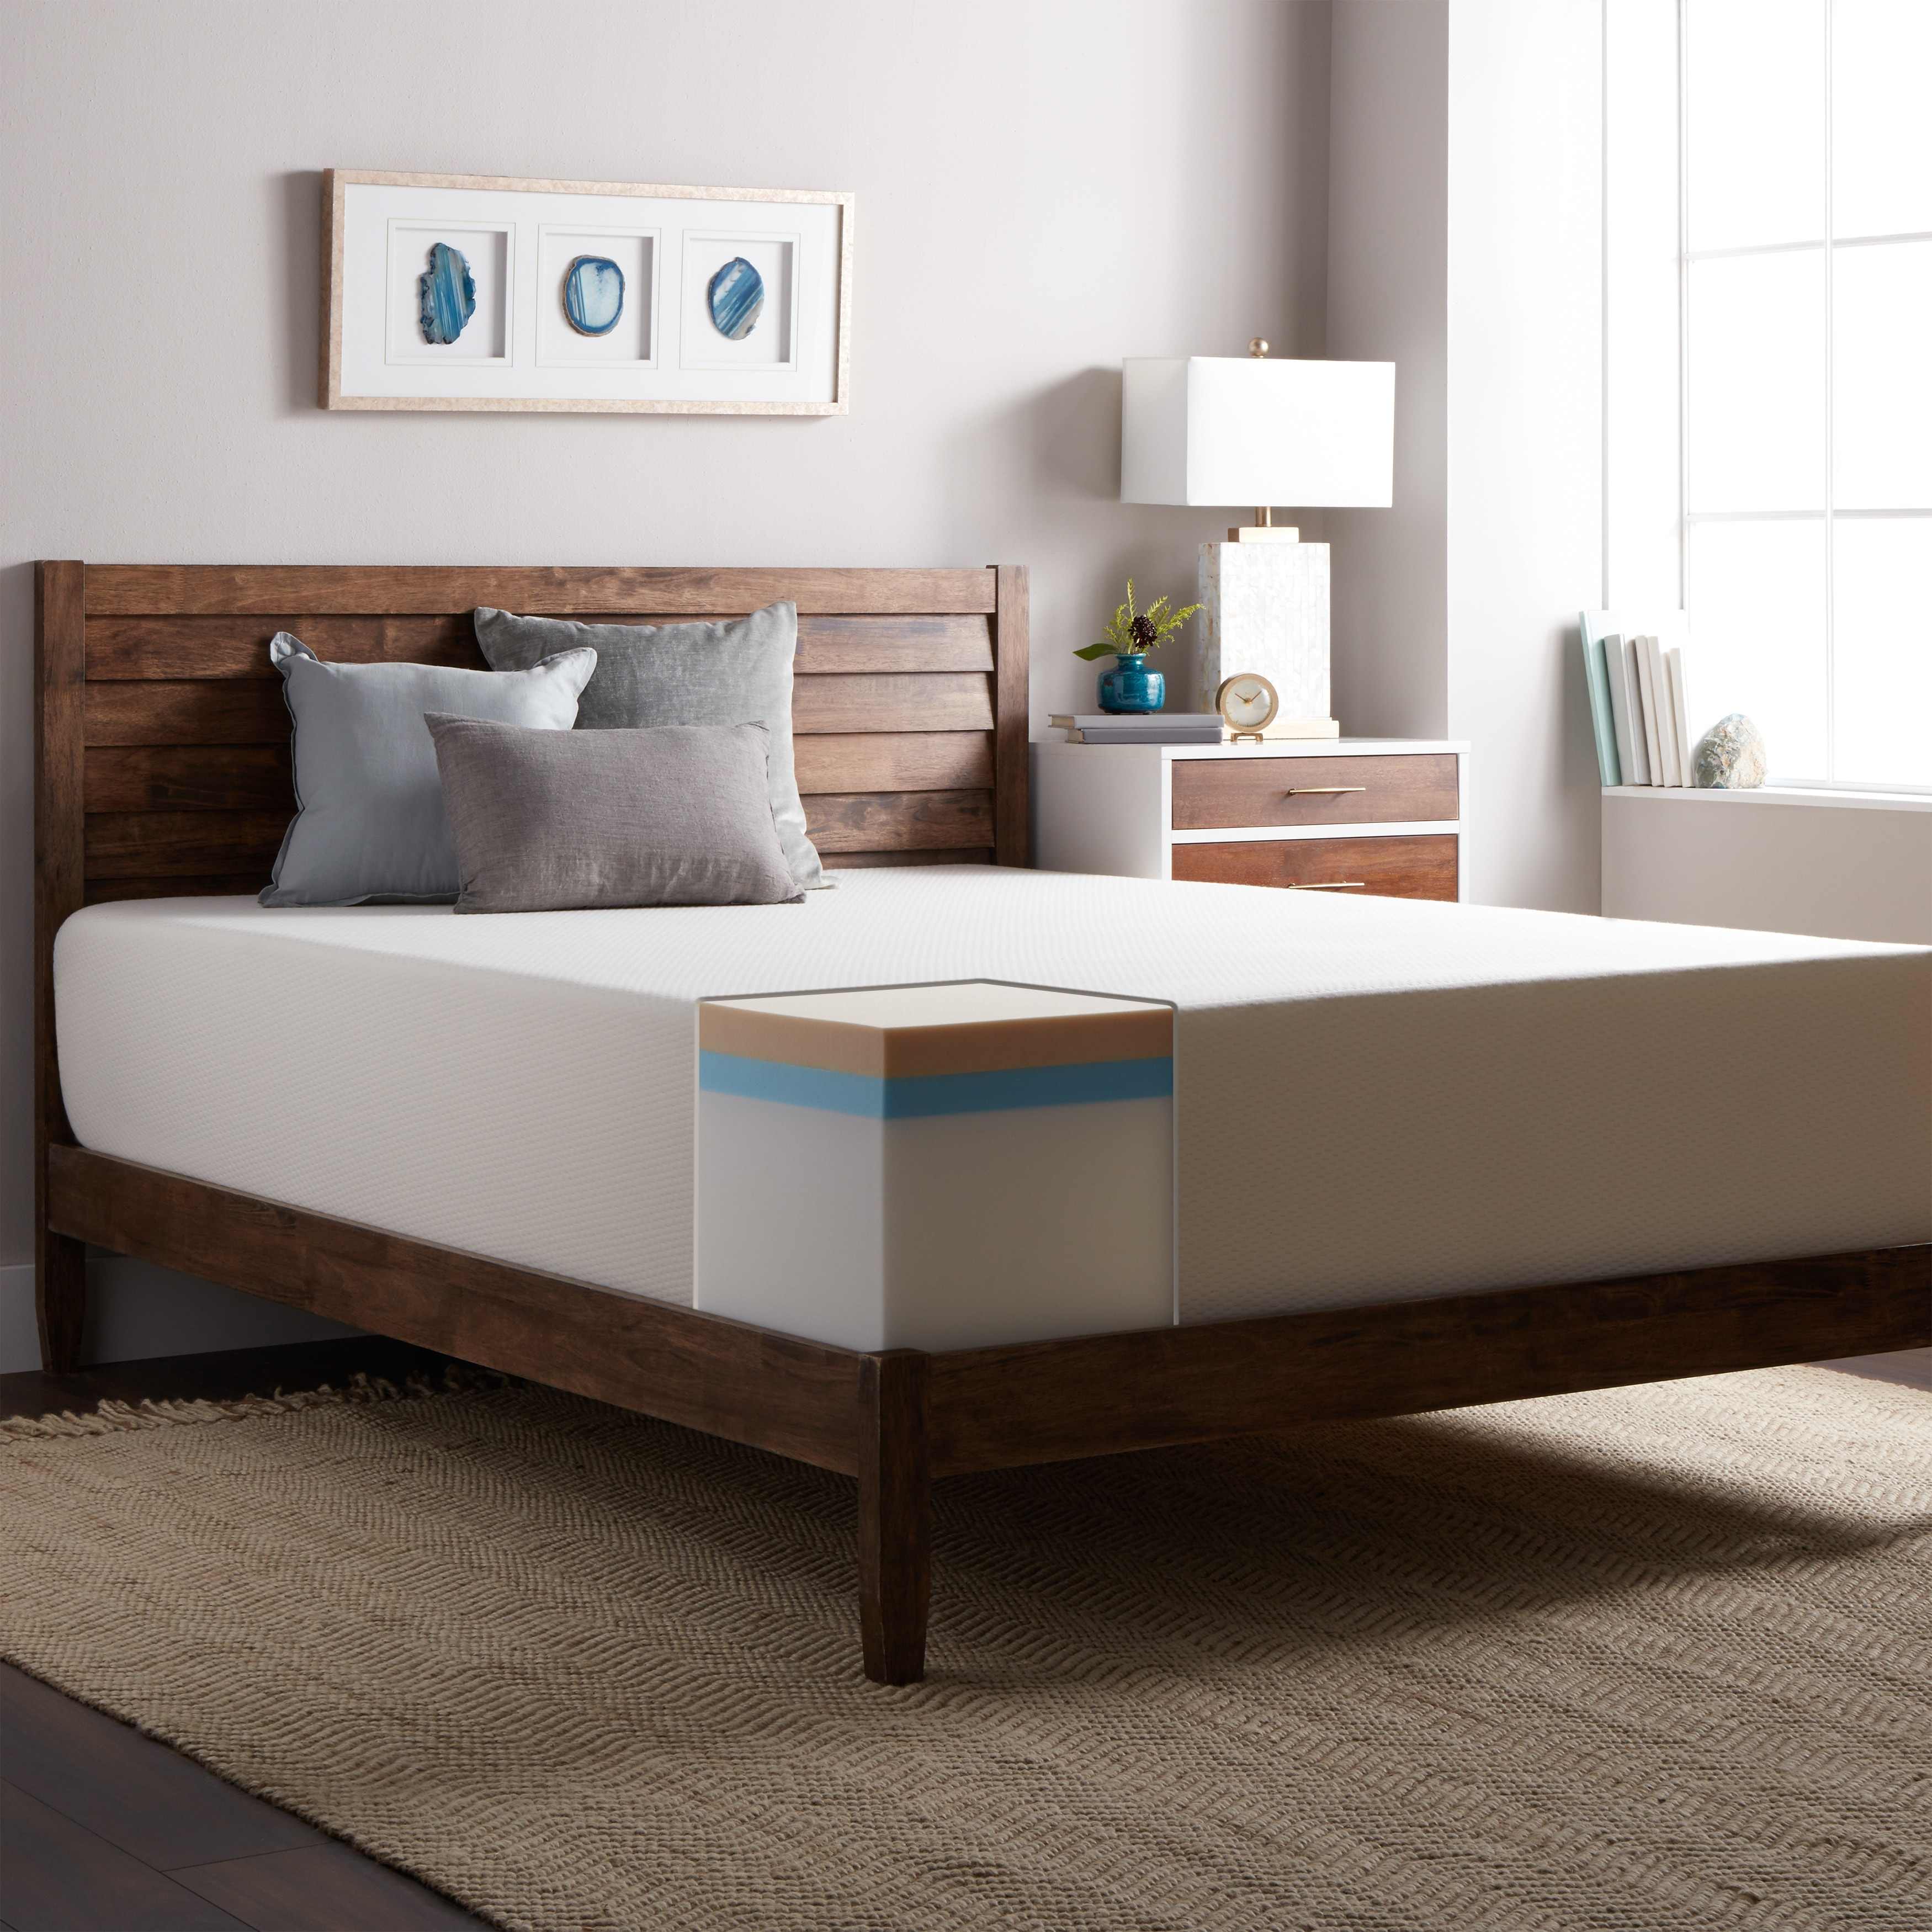 mattresses king bnd seahawk sto name way wayfair designs mattress a foundation default califonia brand